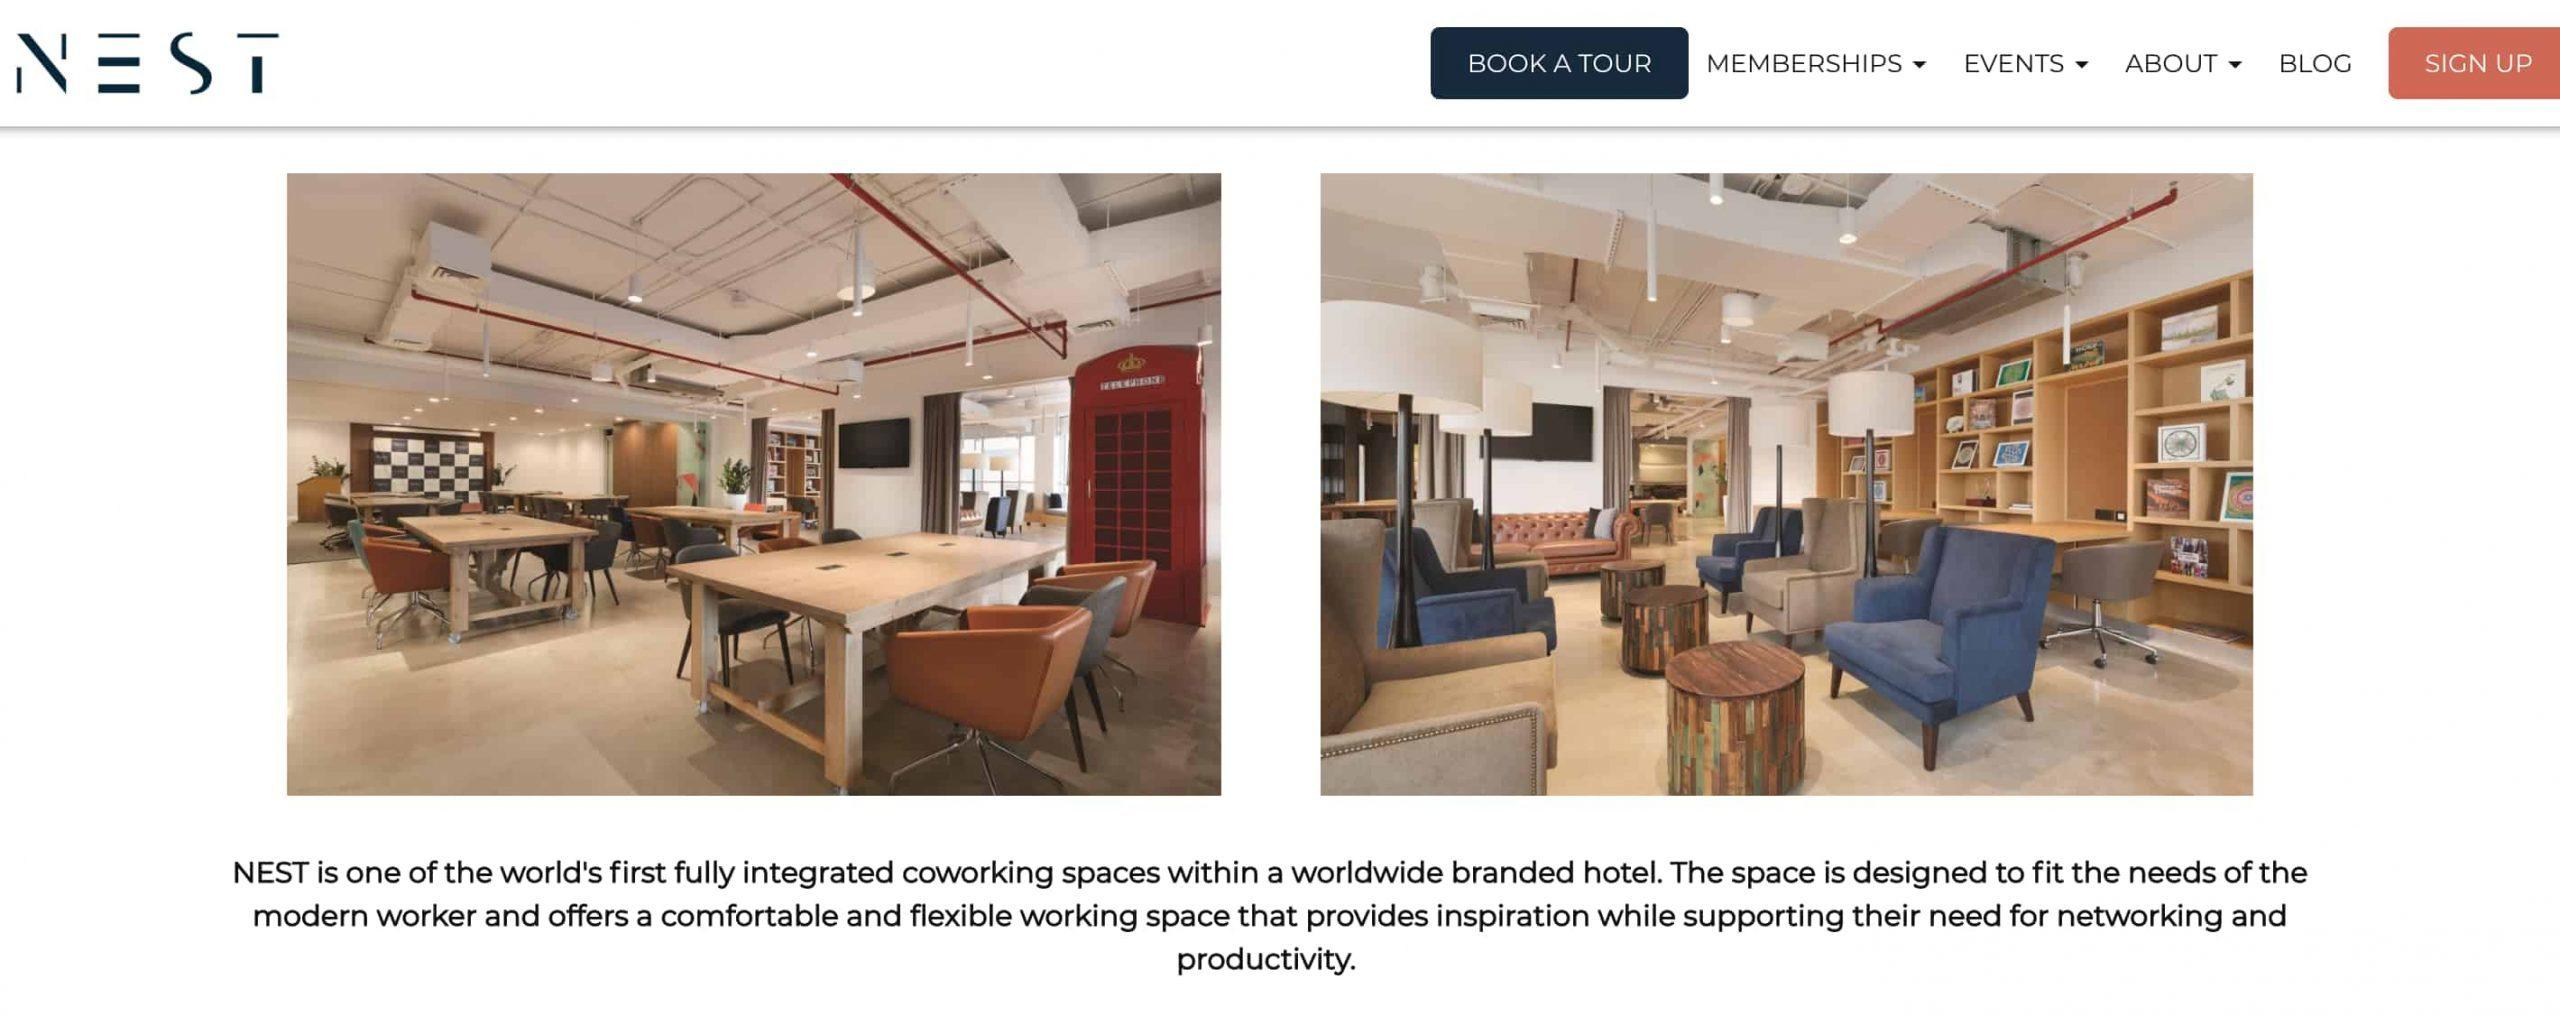 NEST Coworking space Dubai